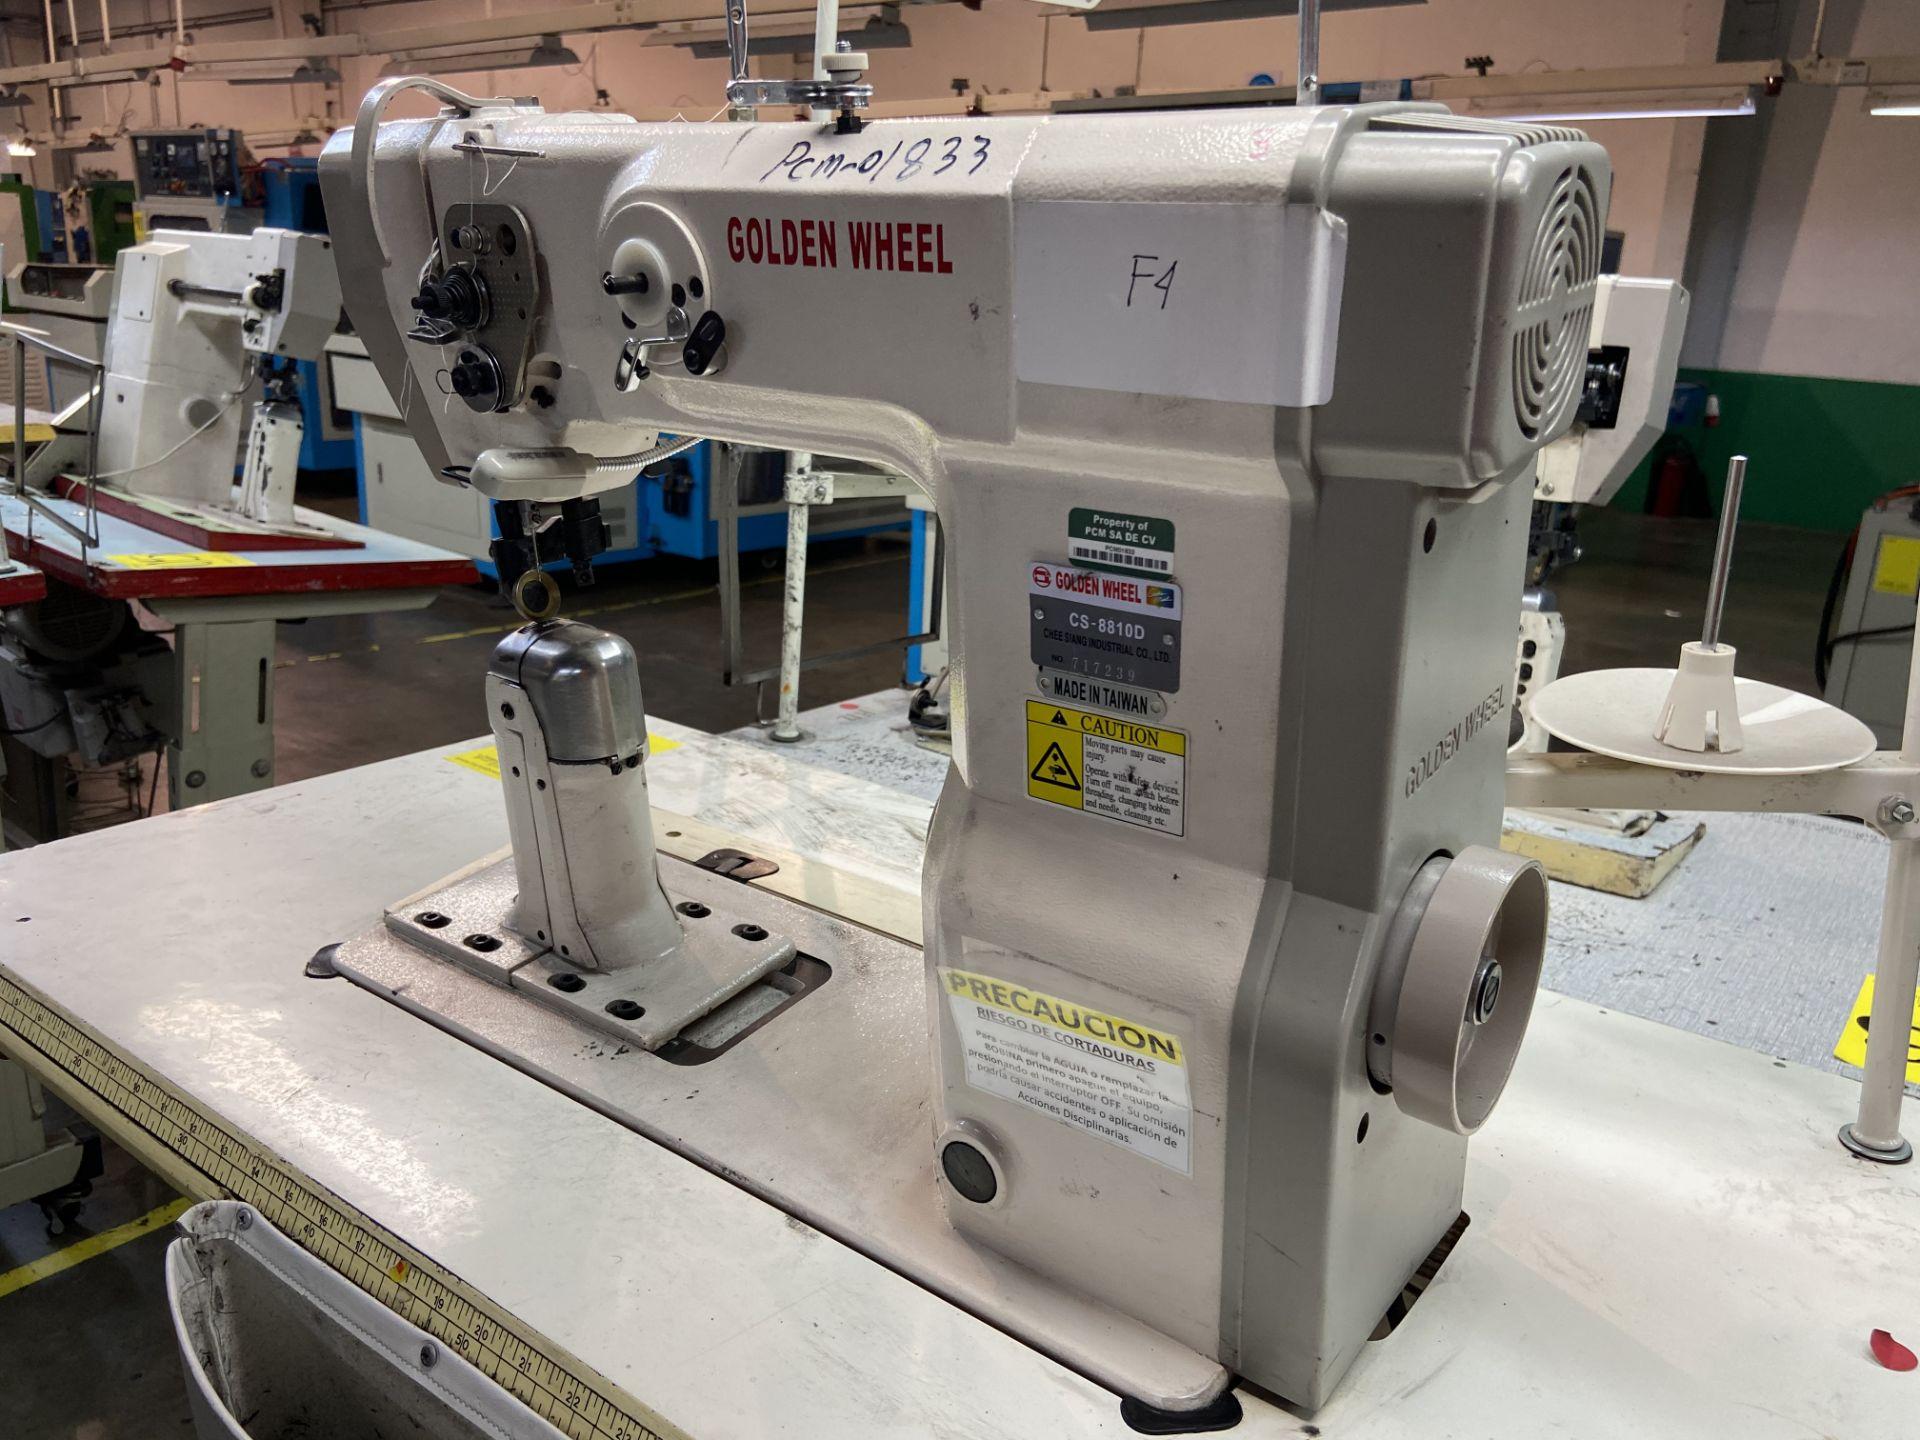 Lot 53 - (2) Máquinas de costura marca Golden Wheel de una aguja